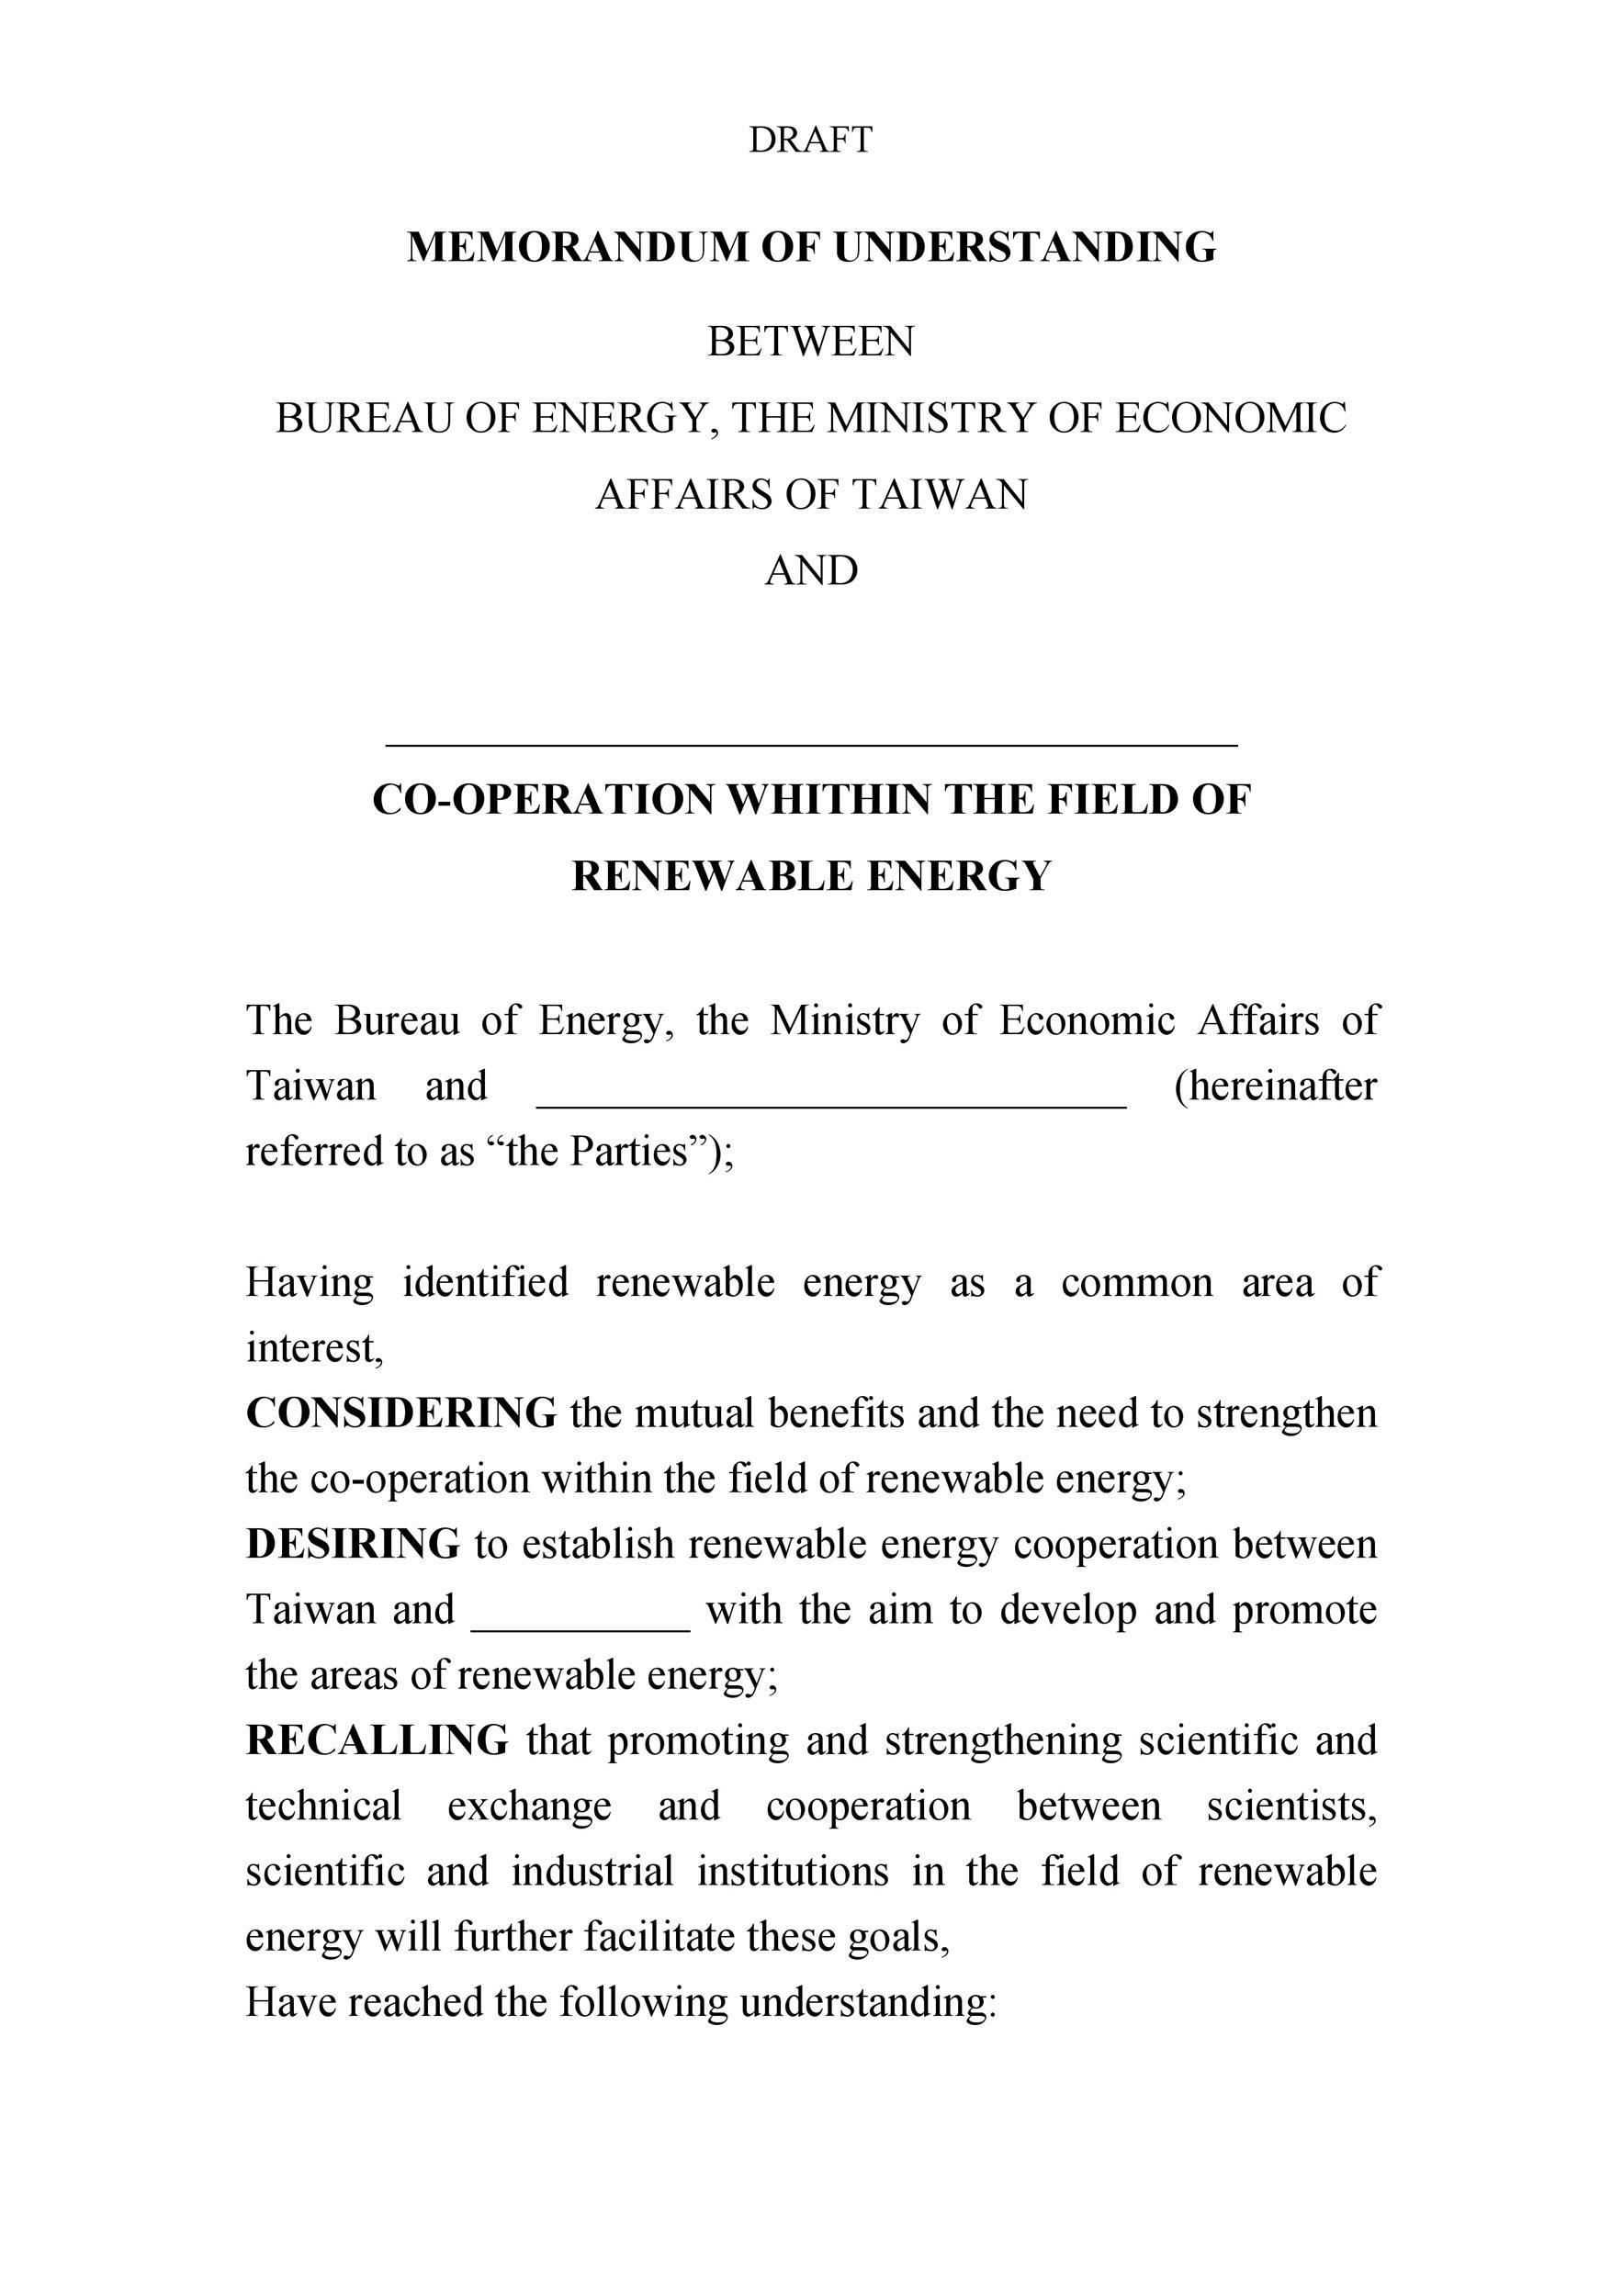 Free Memorandum of Understanding Template 15